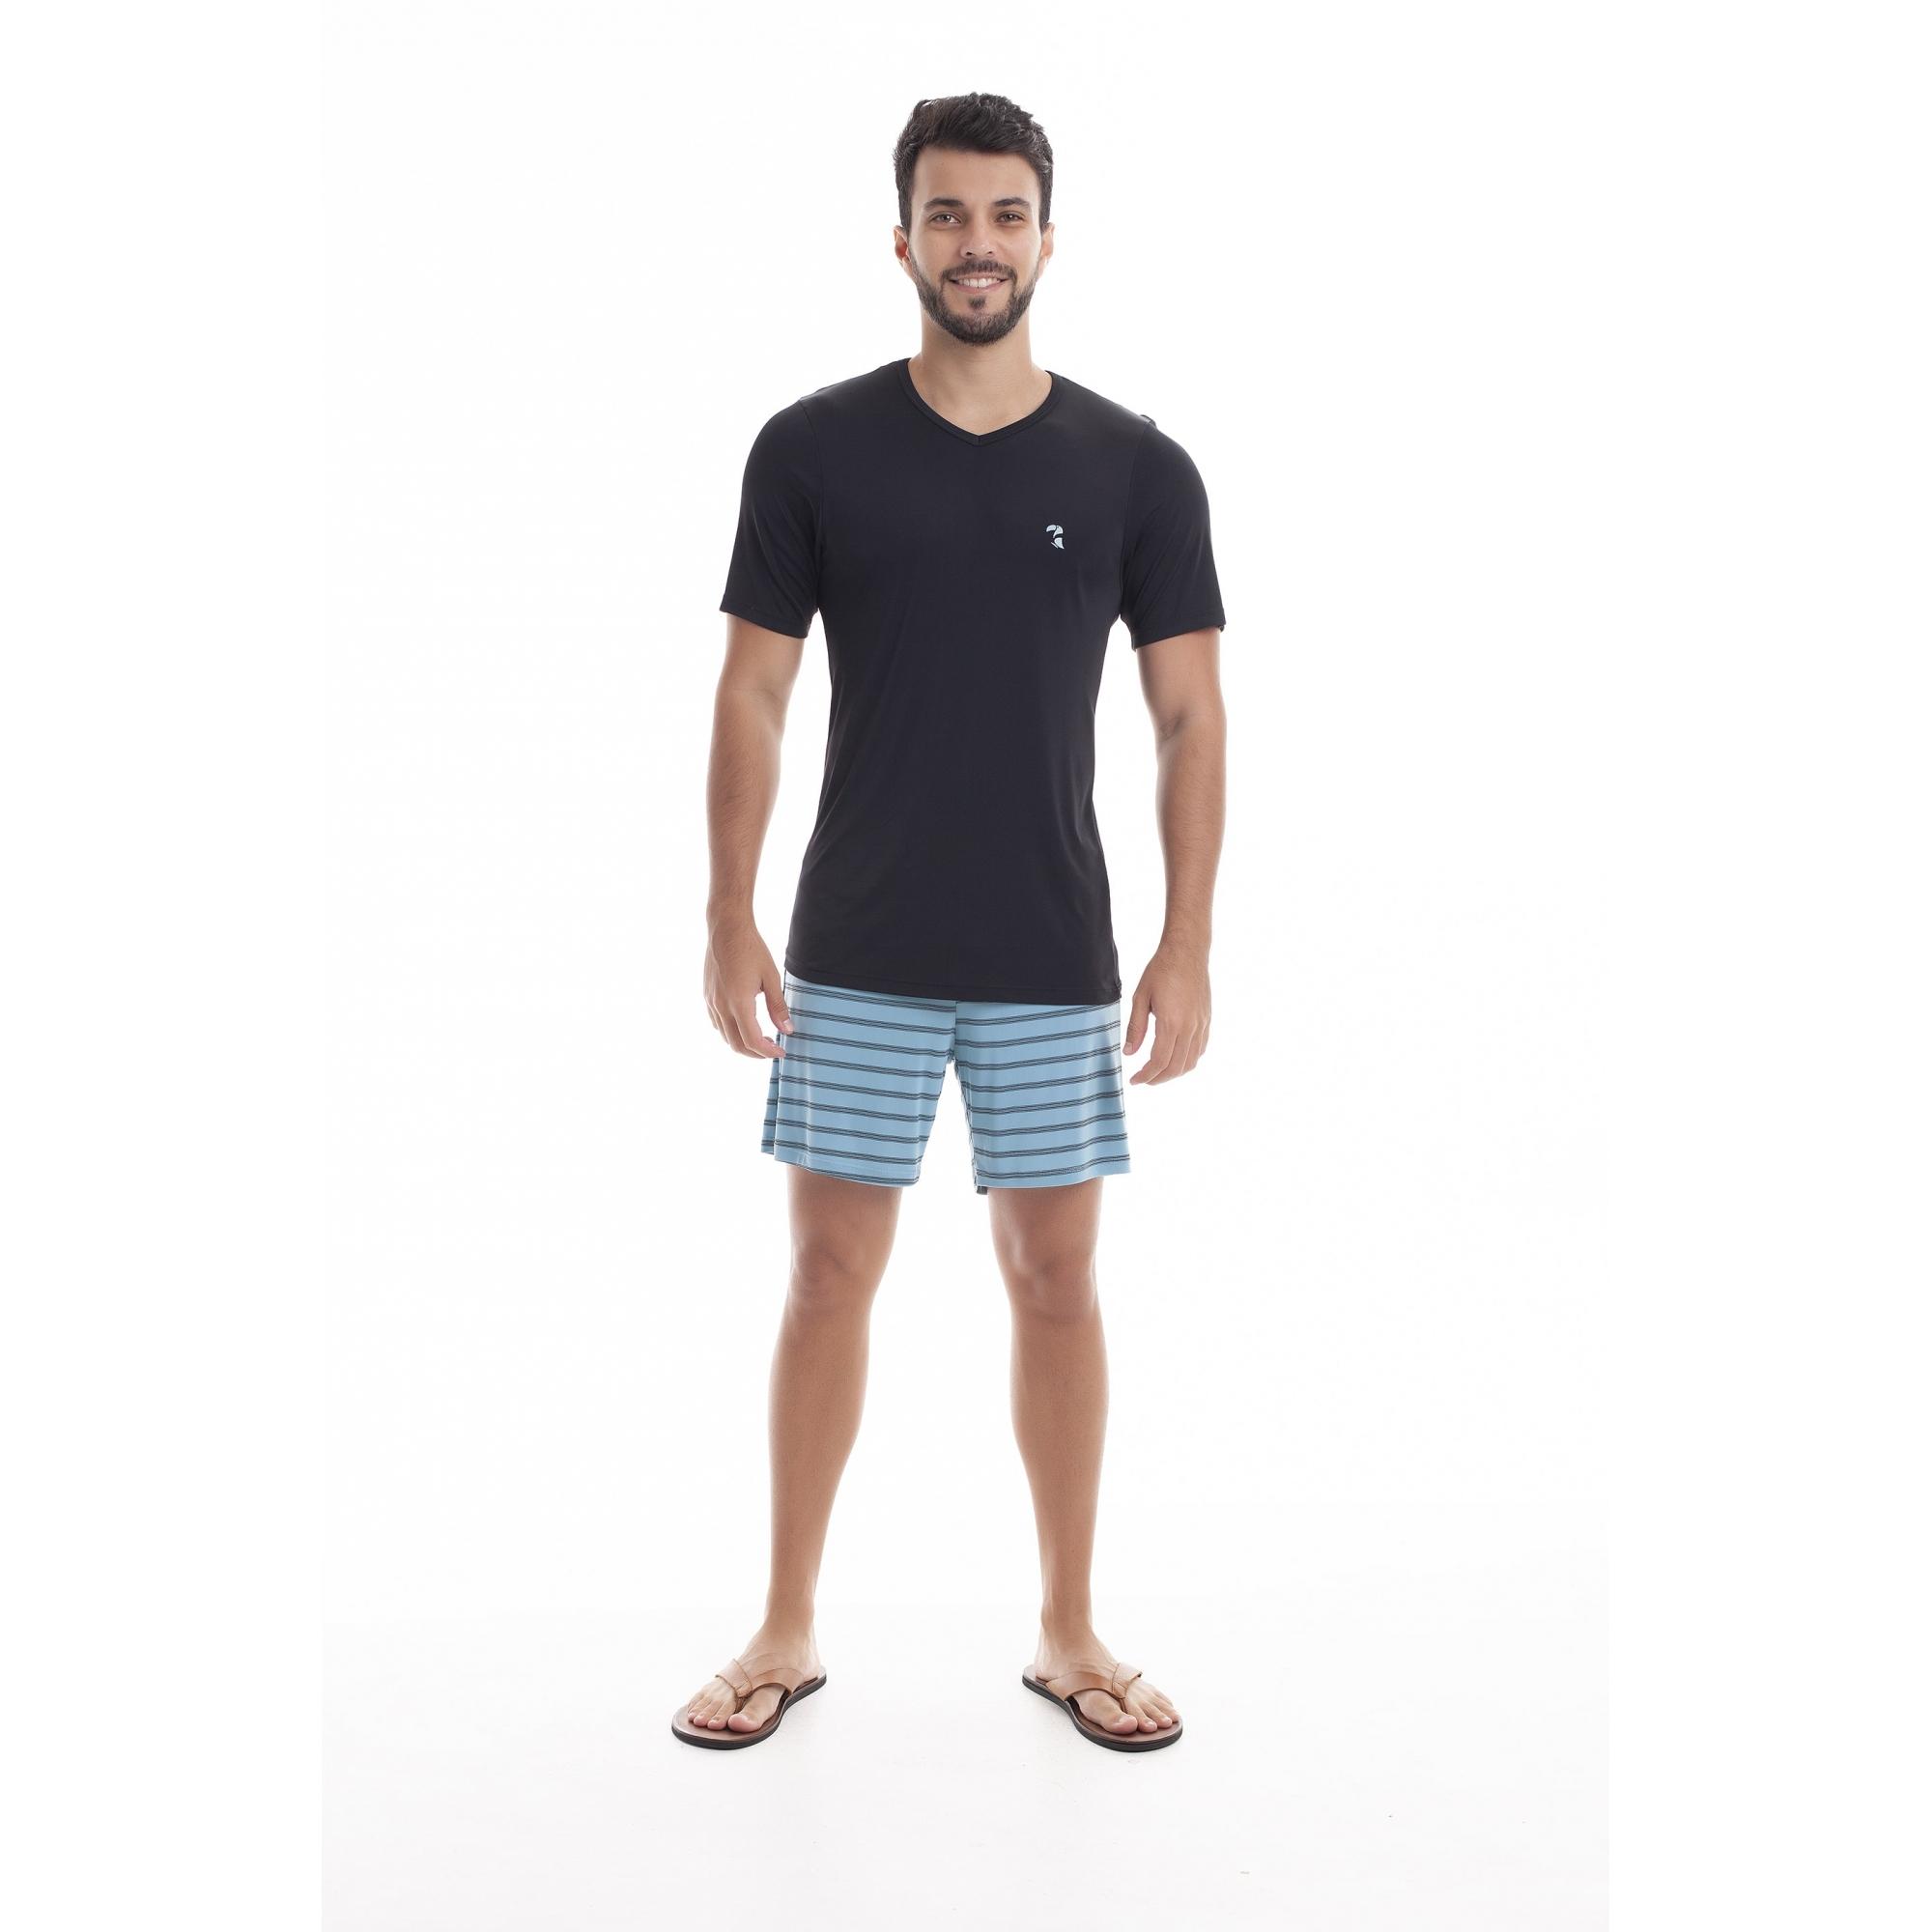 Pijama Masculino Adulto Paulienne Preto com listras em Liganete 09665B47